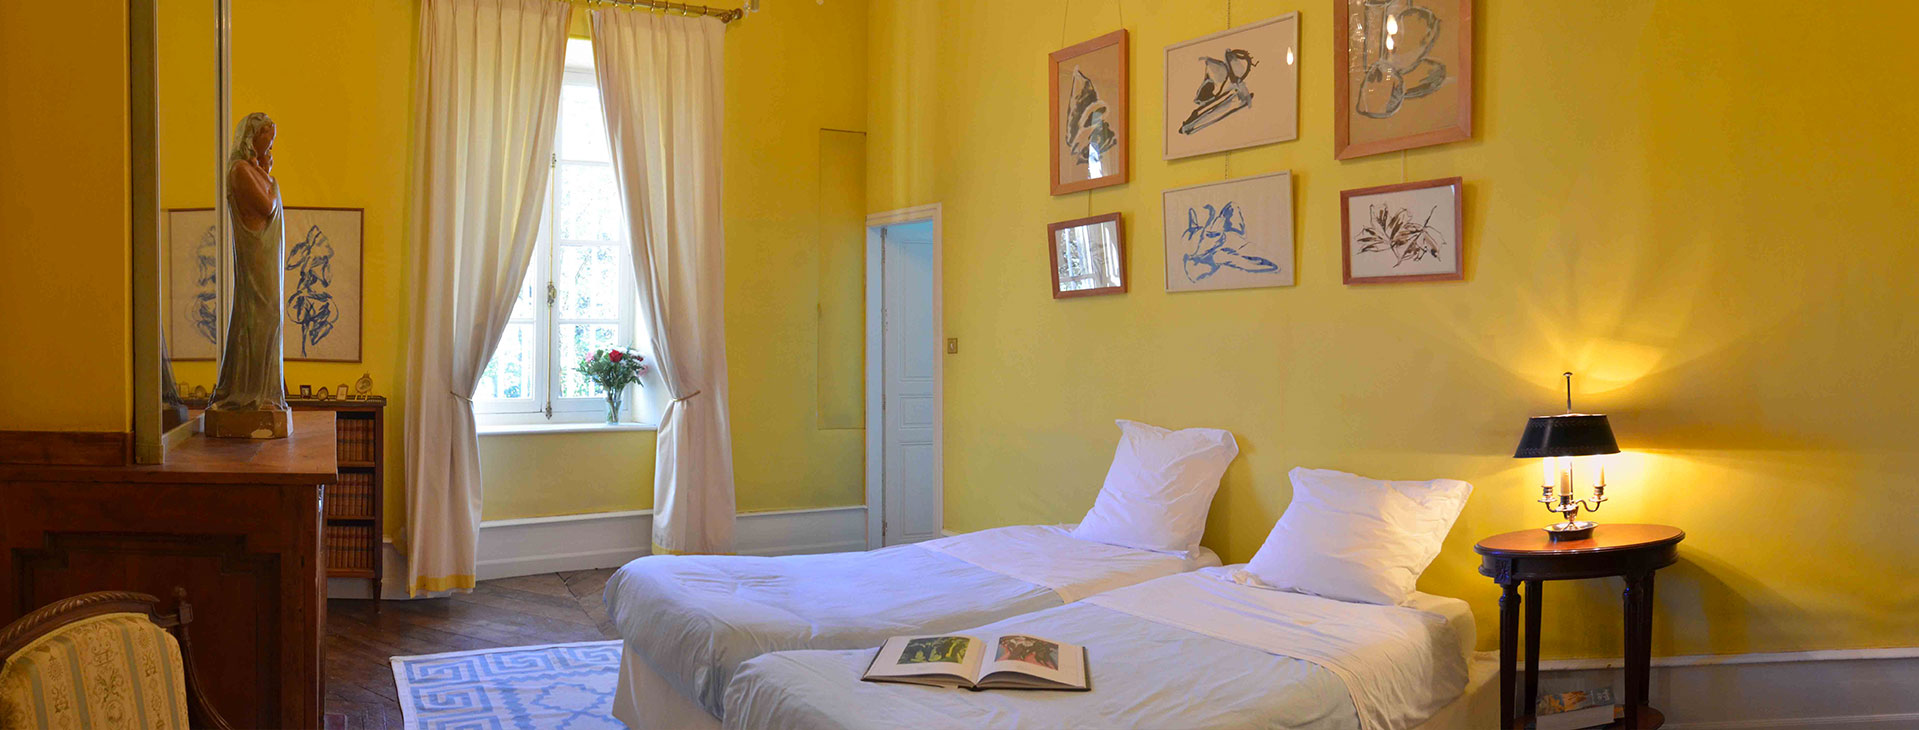 Chambre jaune / Yellow bedroom